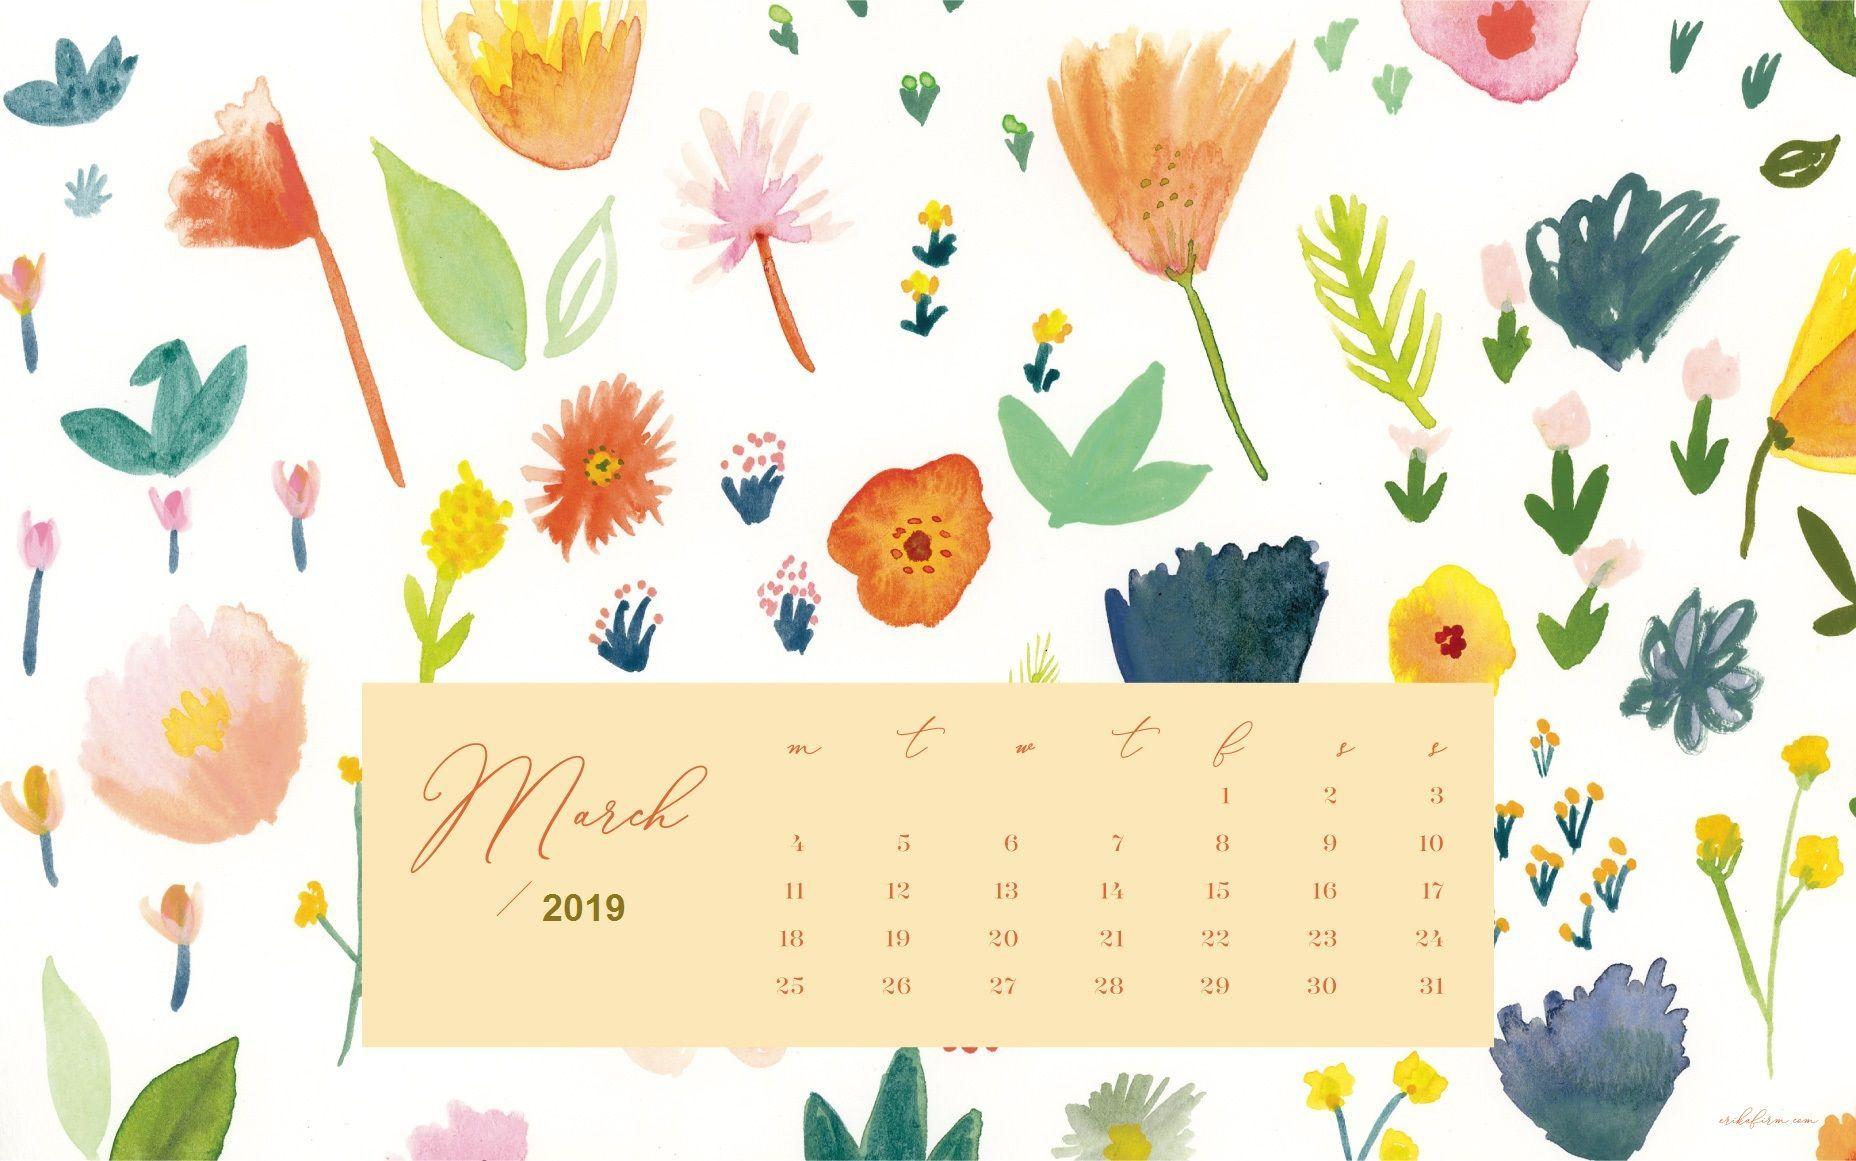 March 2019 Calendar Wallpaper Floral Background Screensaver March 2019calendar Marchcalendar Calendar Wallpaper Desktop Wallpaper Calendar Cute Wallpapers